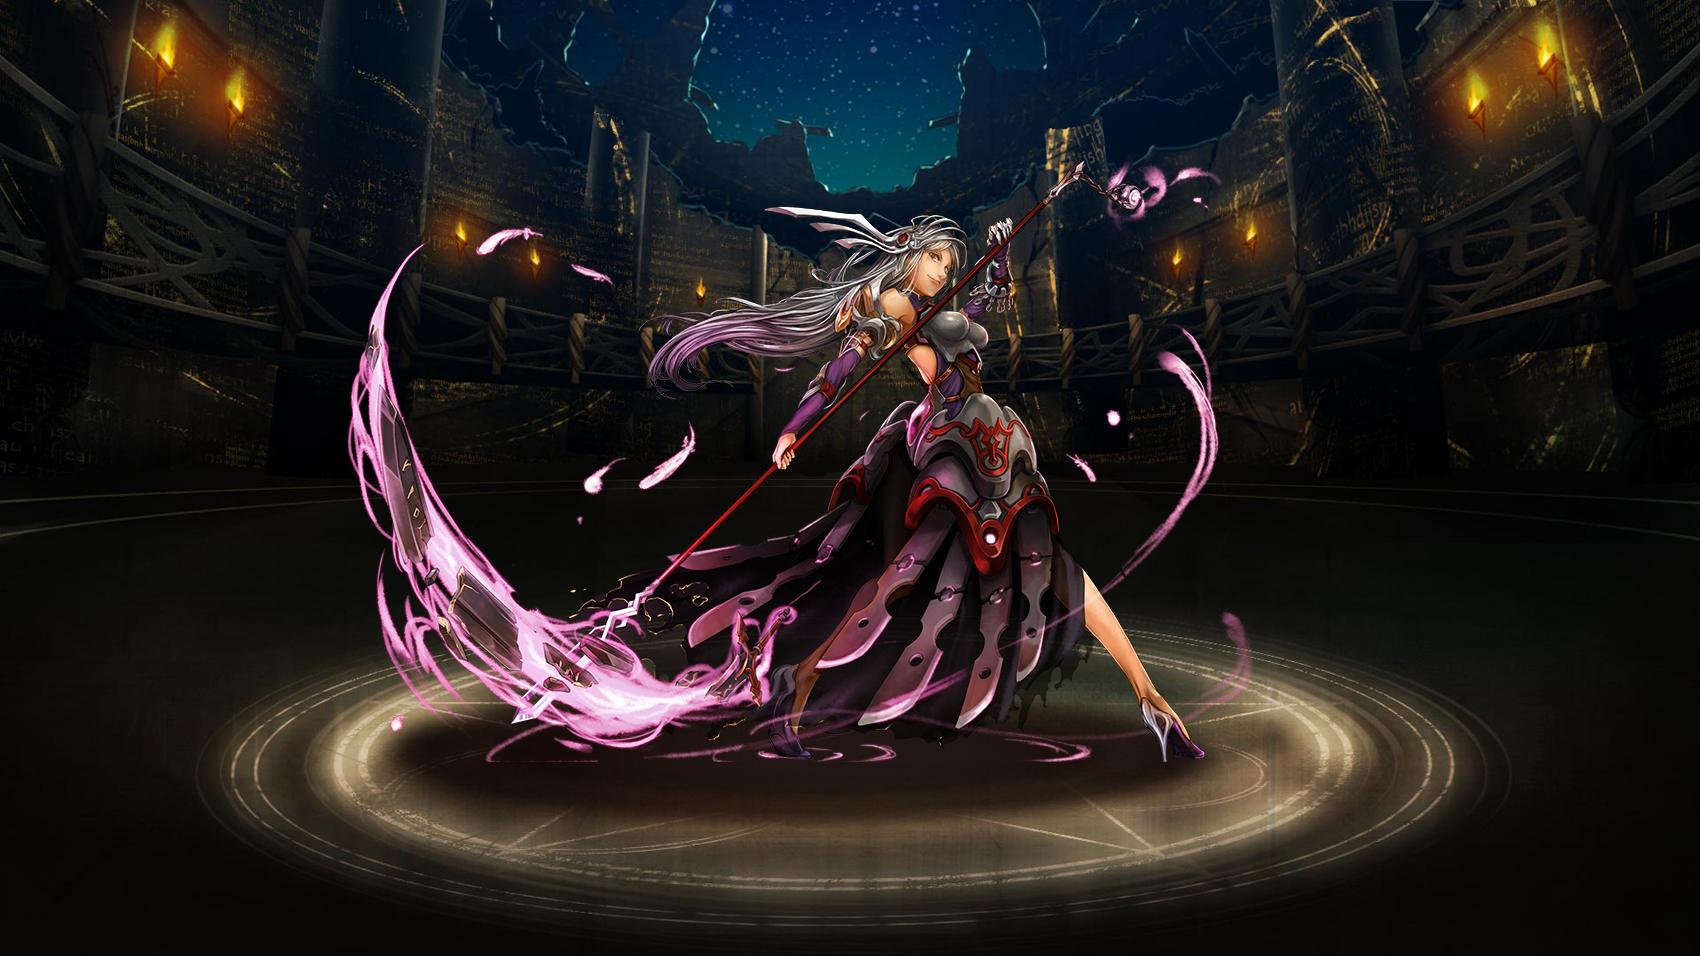 Brynhildr the Scythe Warrior